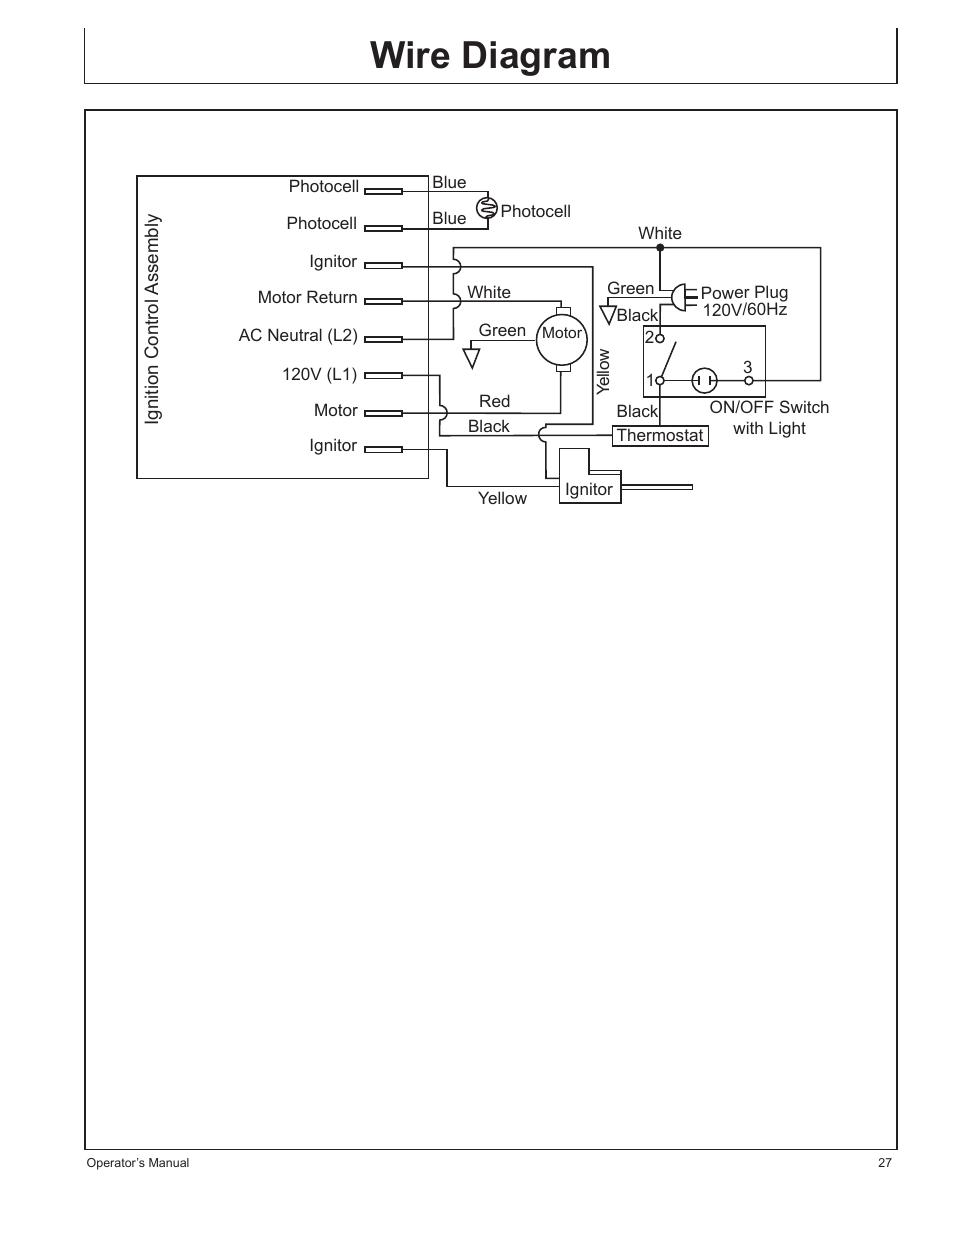 medium resolution of john deere la115 engine diagram